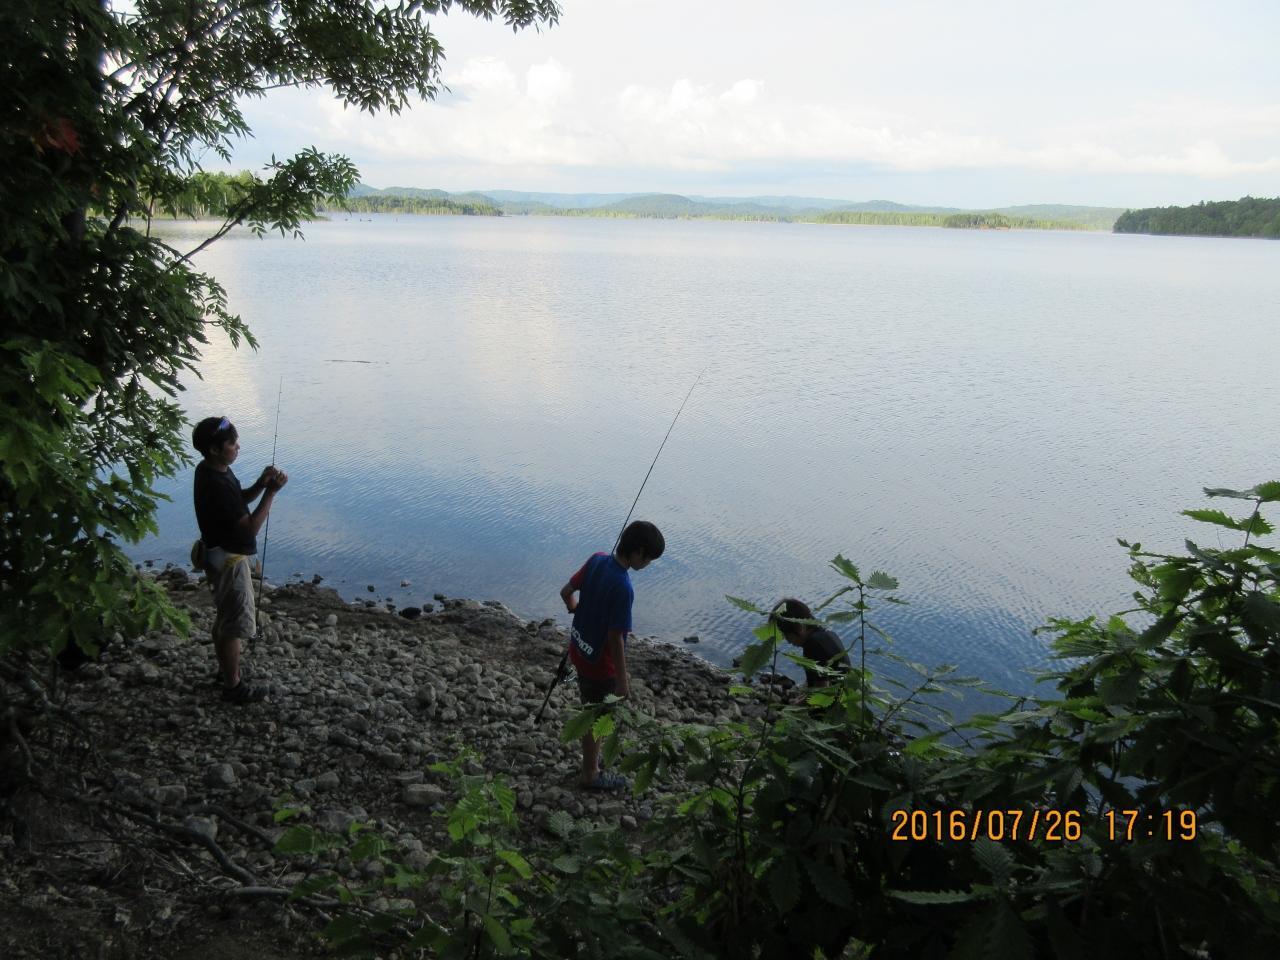 朱鞠内湖釣り情報